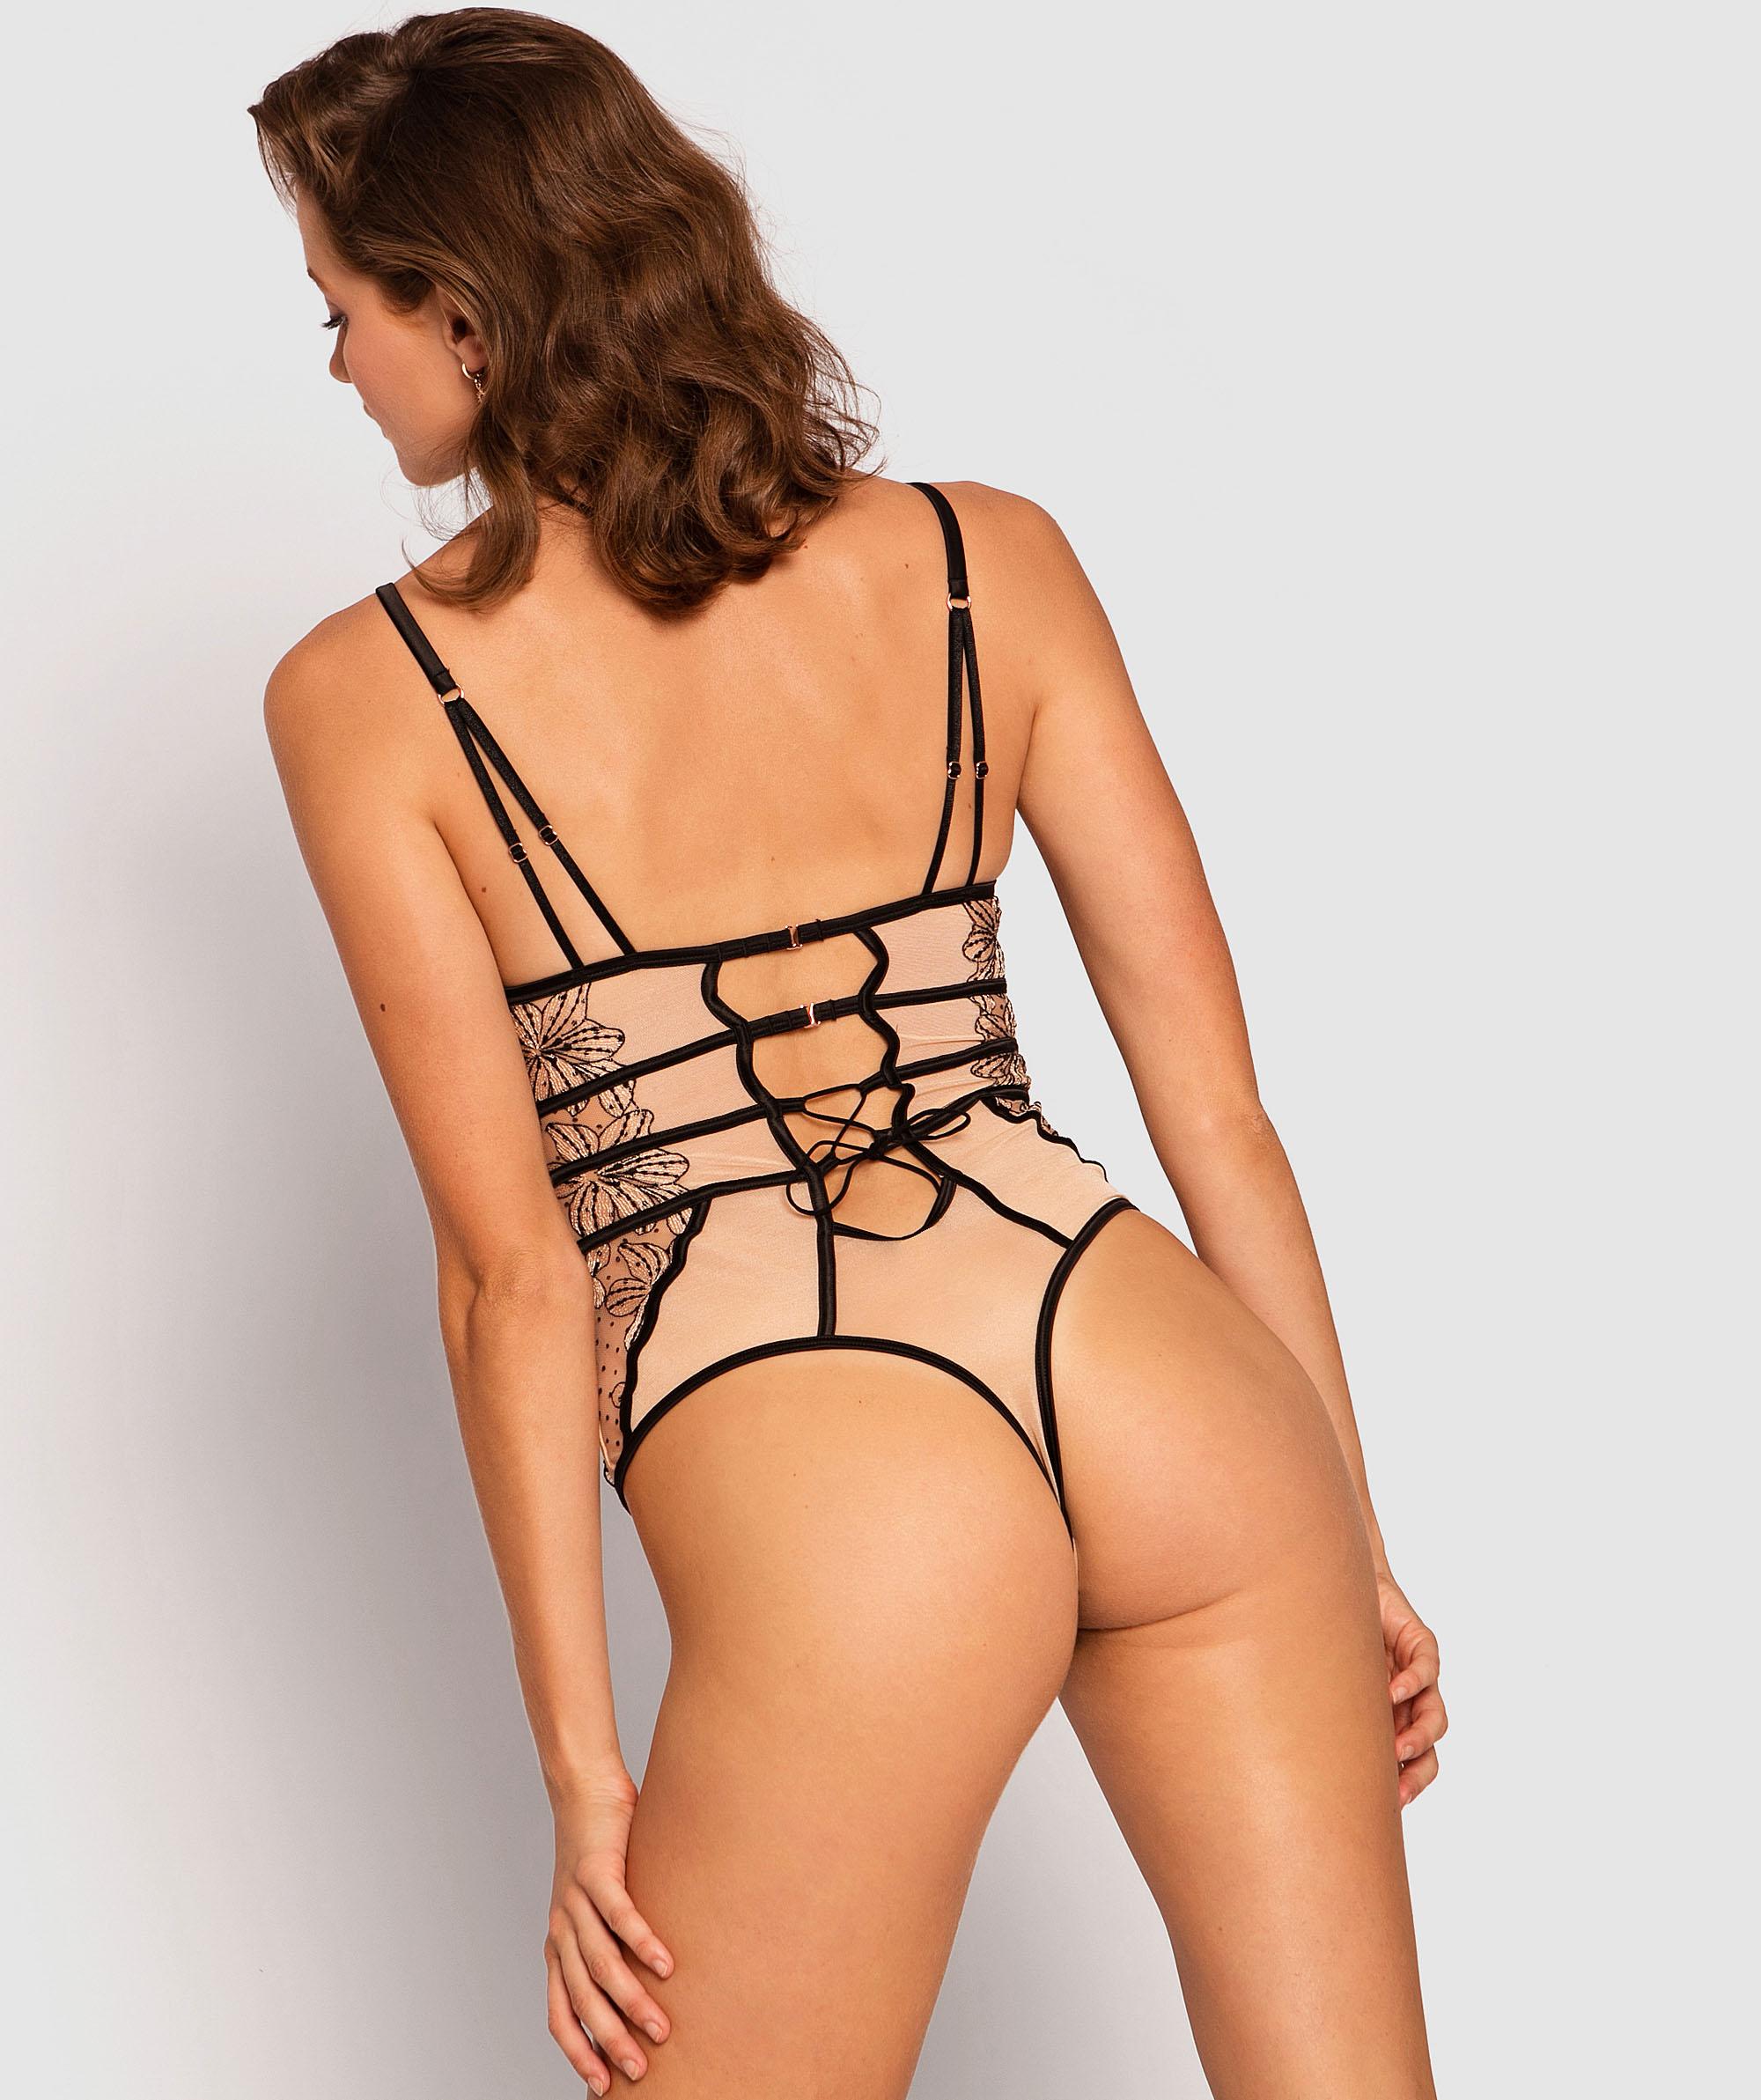 Enchanted Maiella Bodysuit - Black/Nude